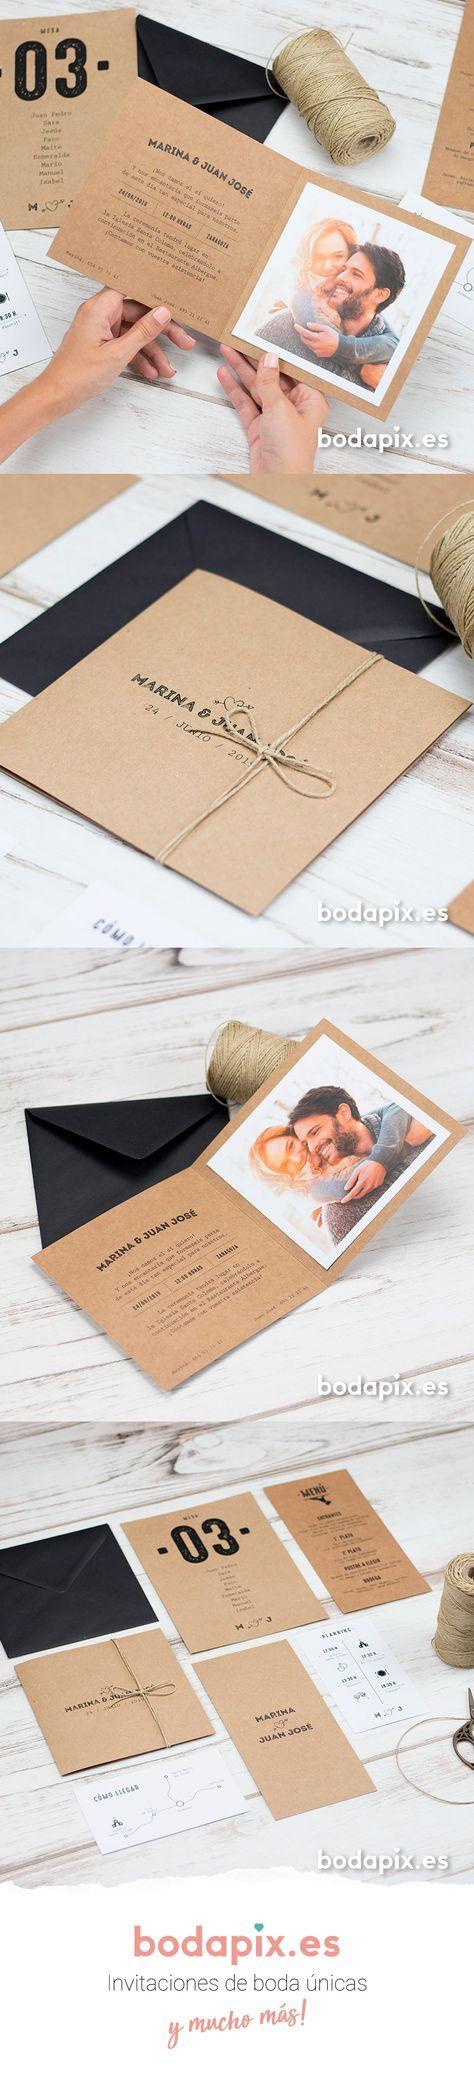 Invitación de boda con foto One Love - desde 1.10€ ▷ Bodapix